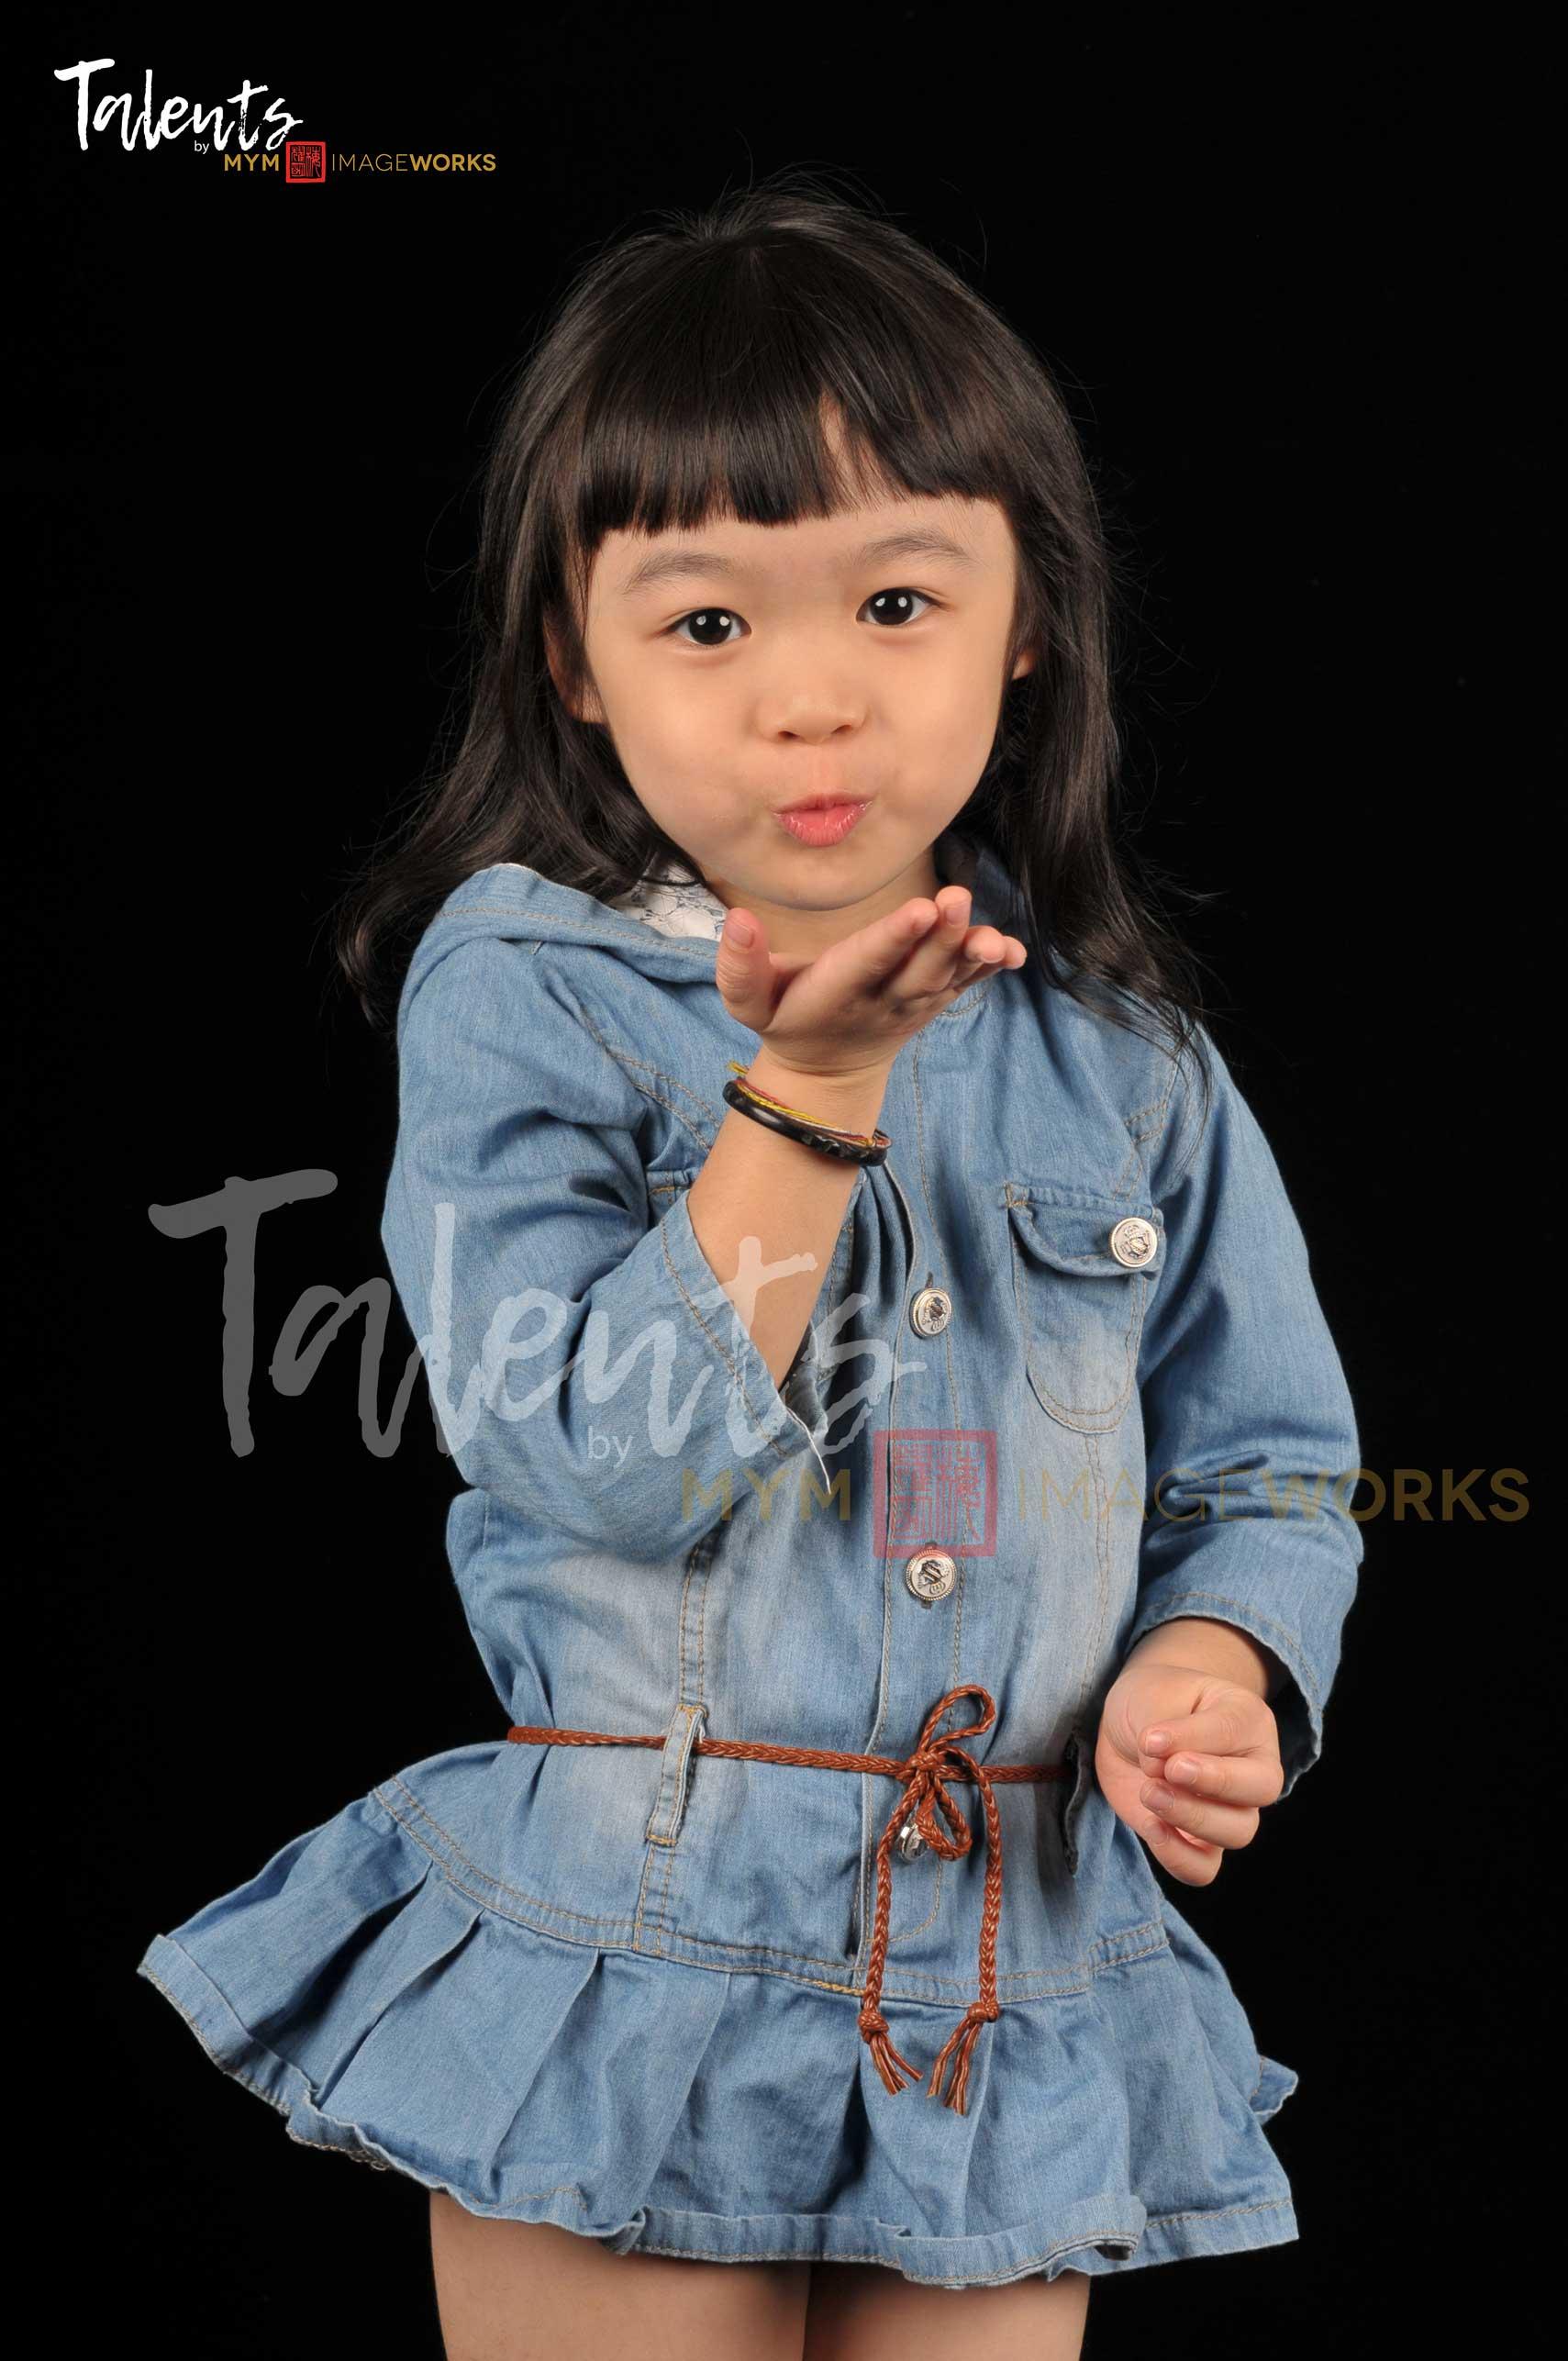 MYM-imageworks-talents-Renee-4